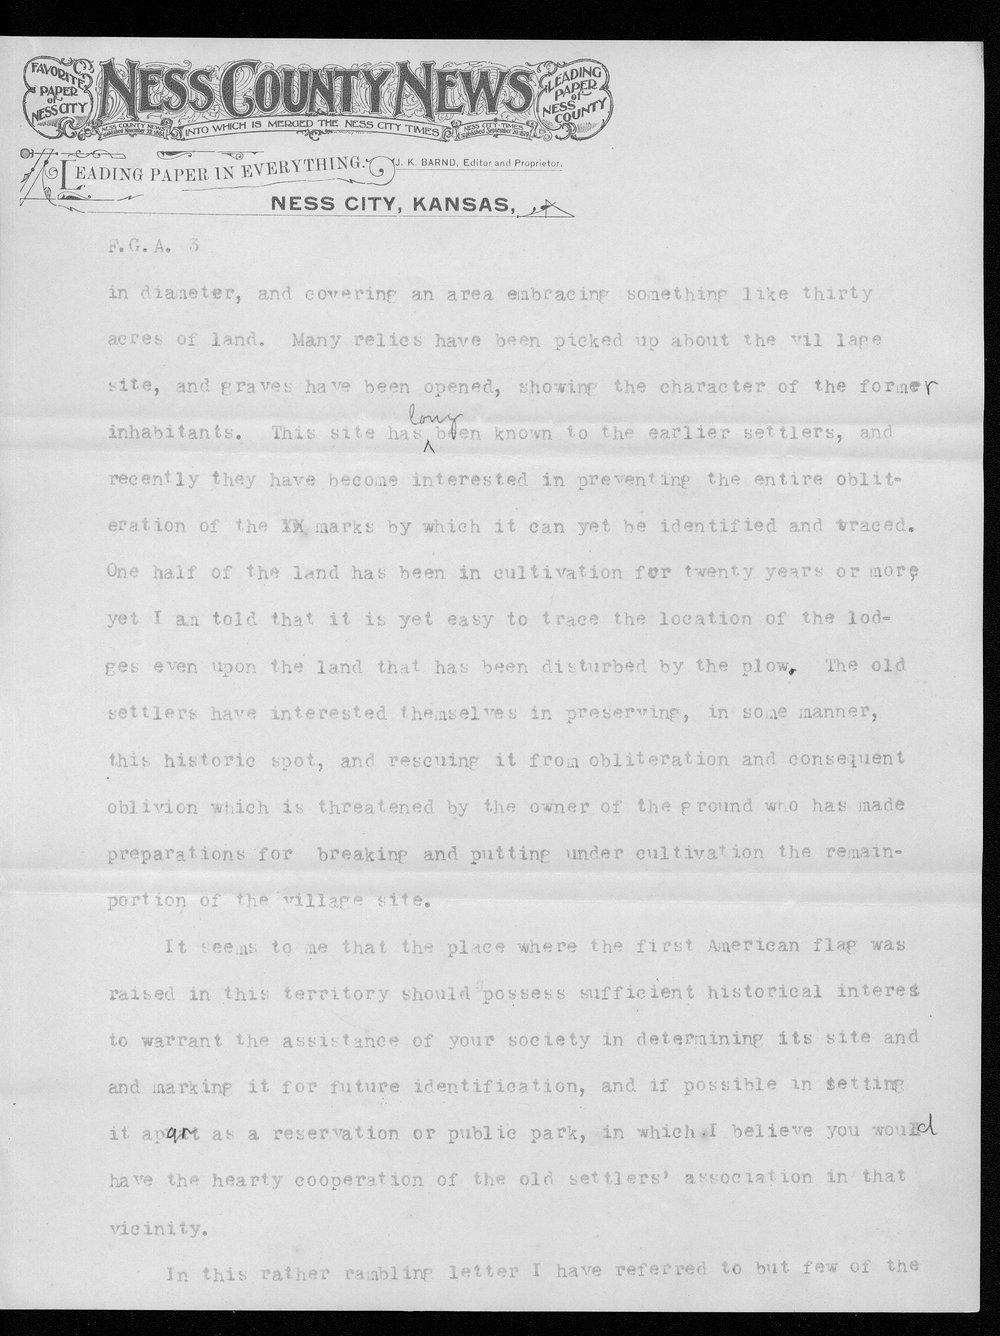 J.K. Barnd to Franklin G. Adams - 3